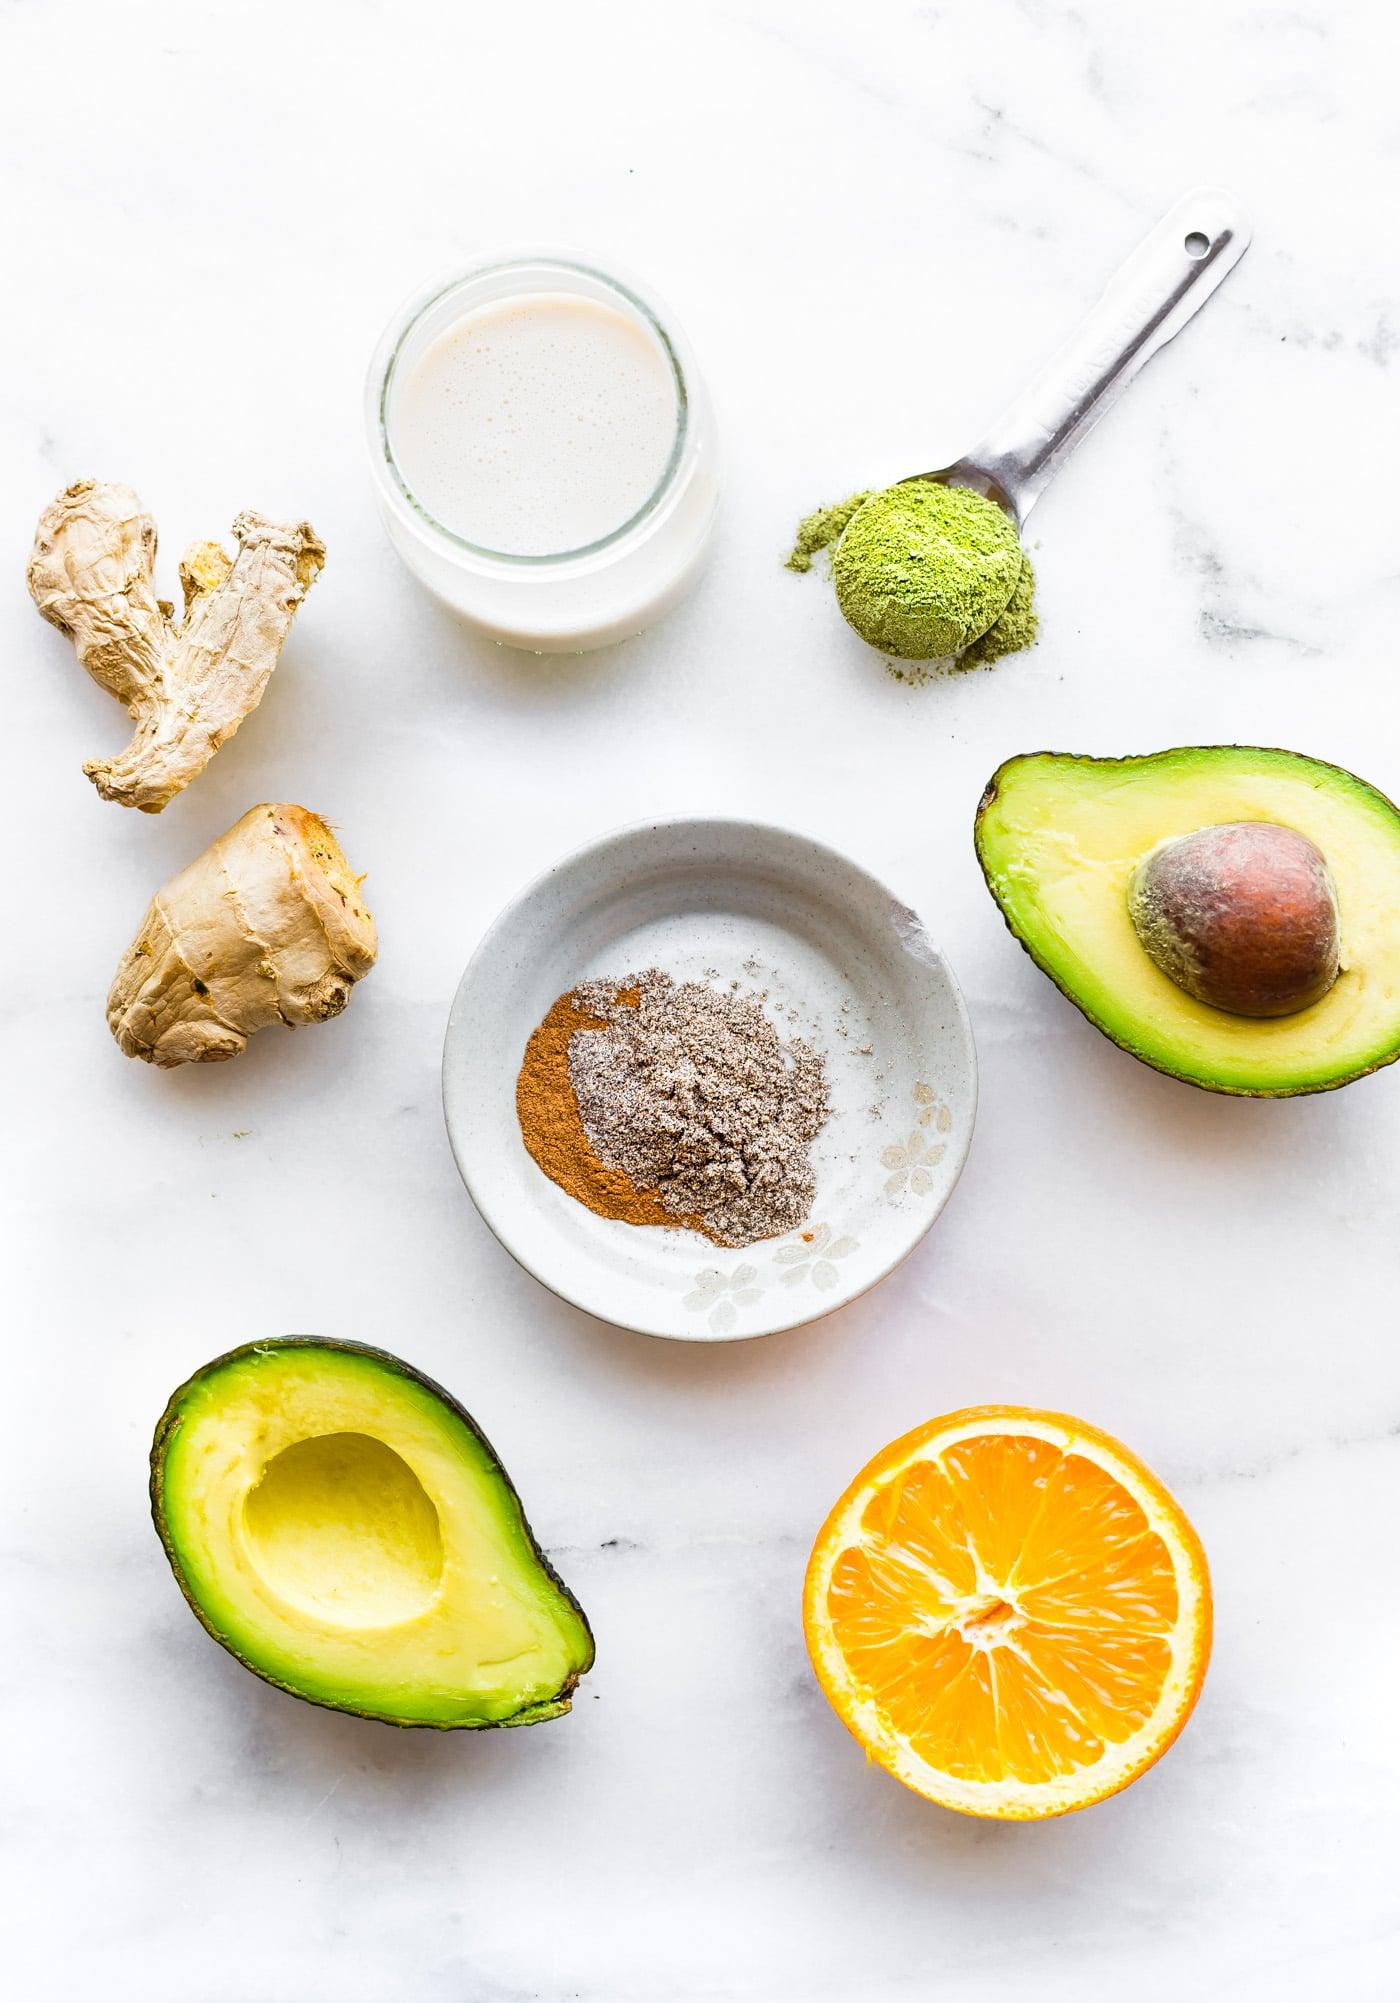 Creamy Coconut Spirulina Superfood Smoothie Recipe